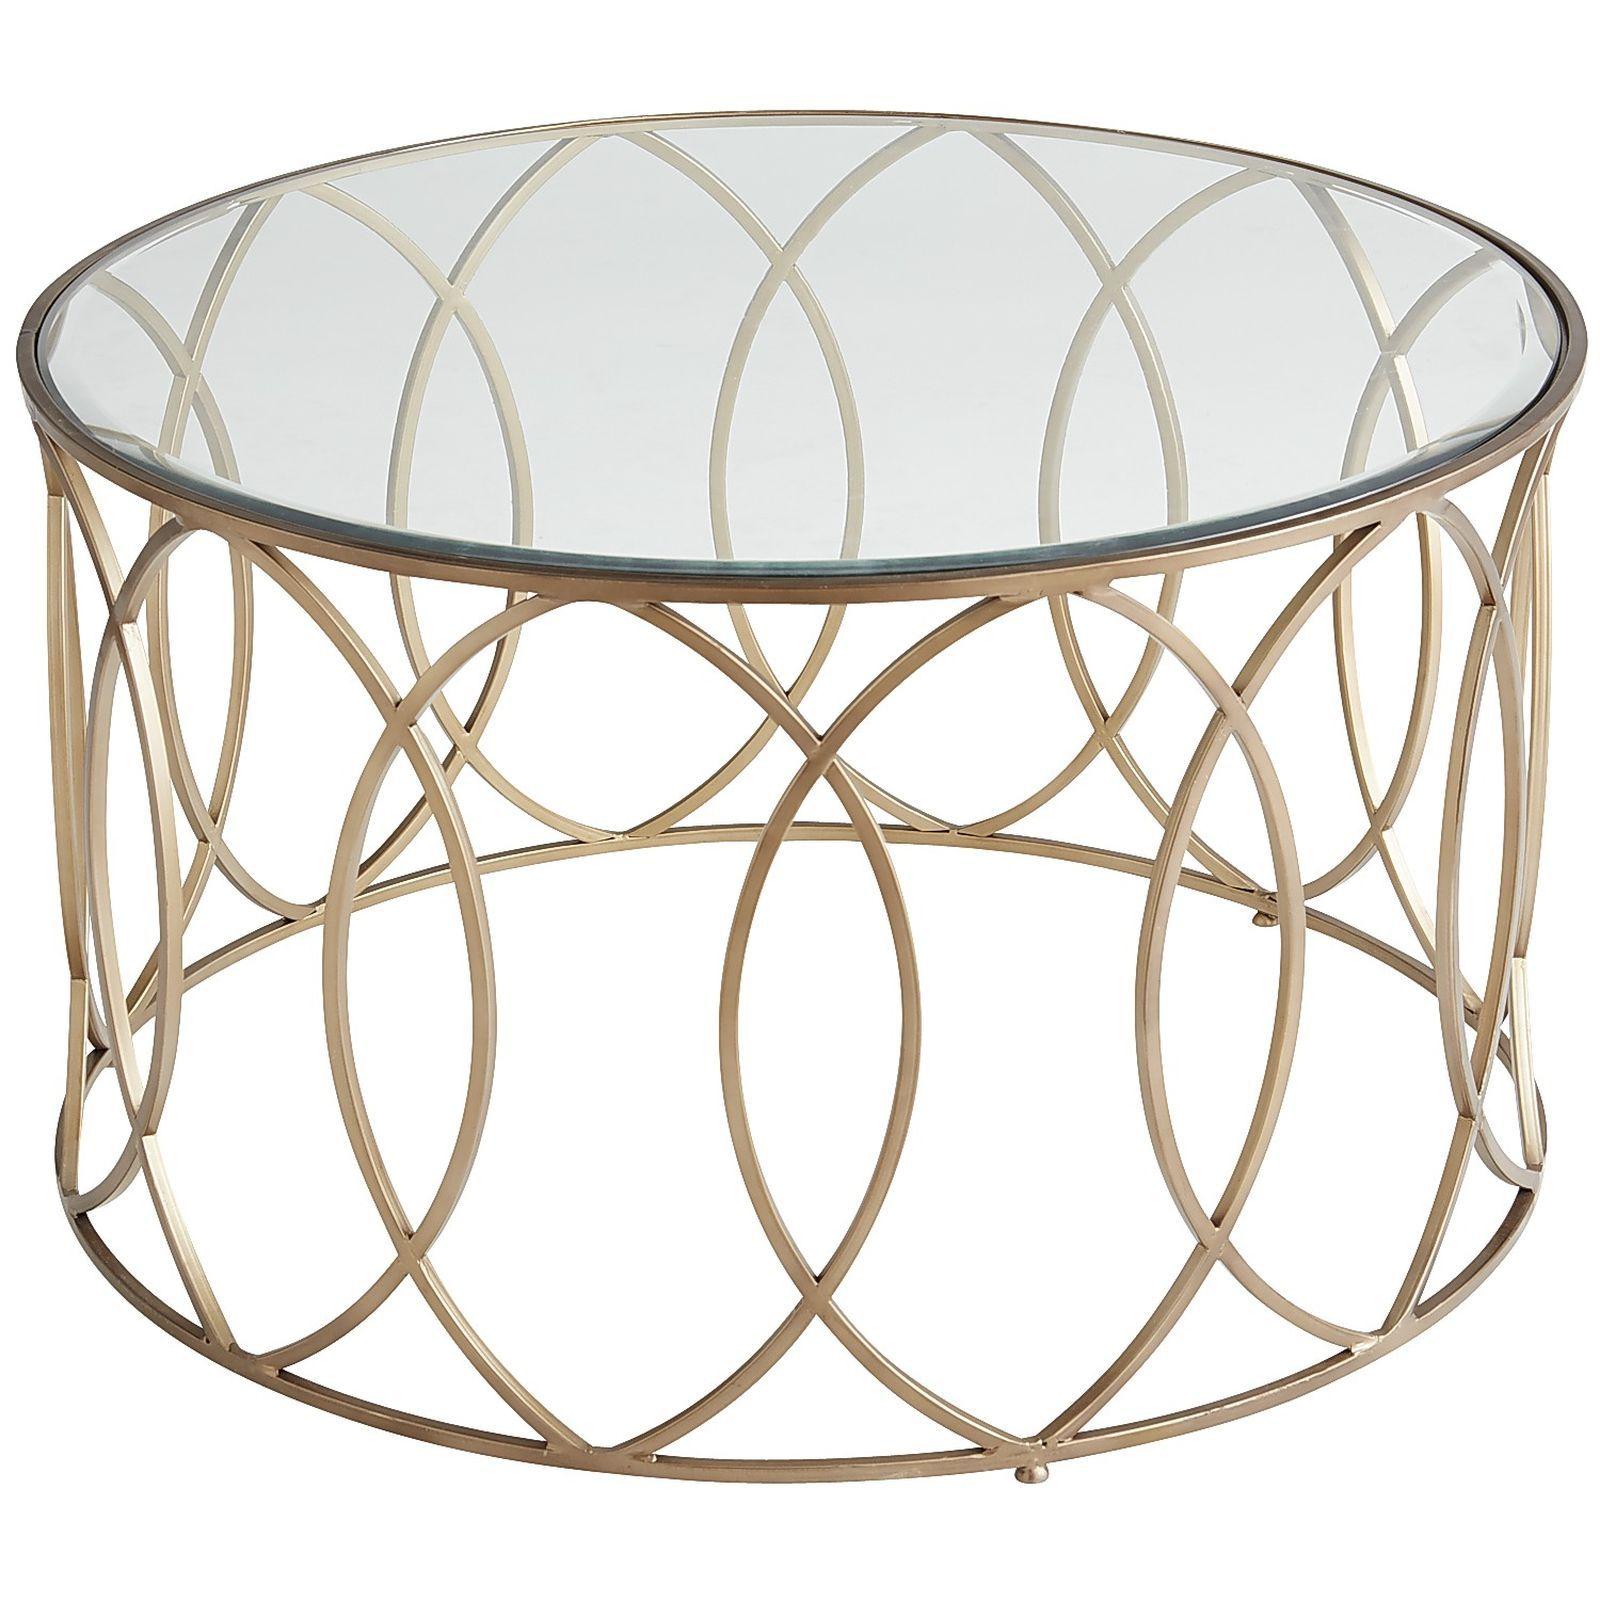 Elana Bronze Iron Round Coffee Table Geometric Designs Living - Geometric round coffee table